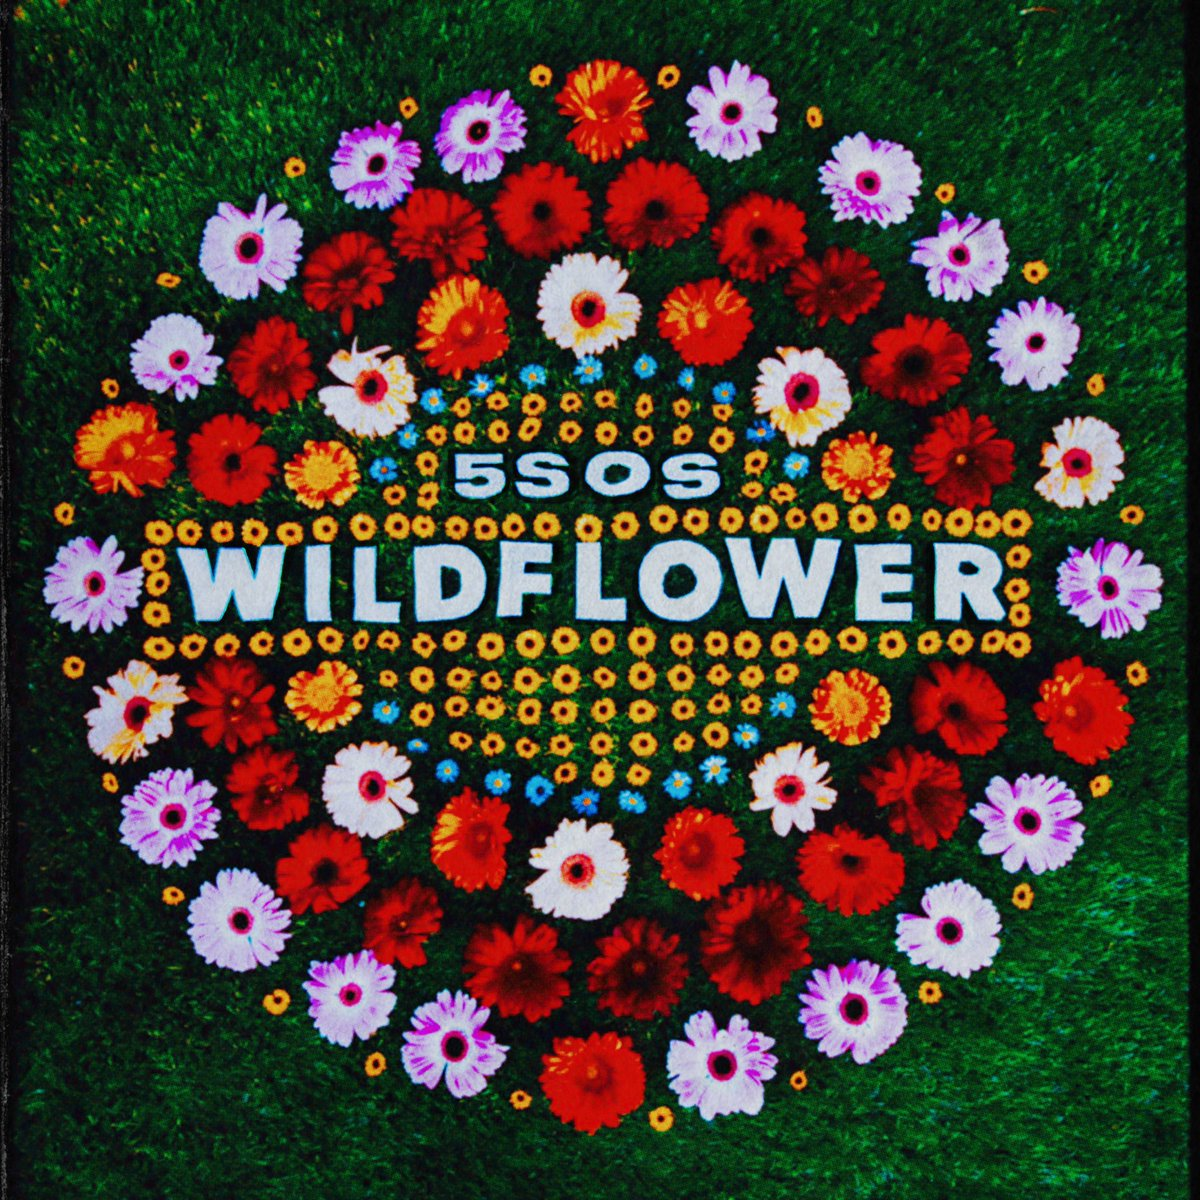 Wildflower // March 25 // smarturl.it/CALM5SOS